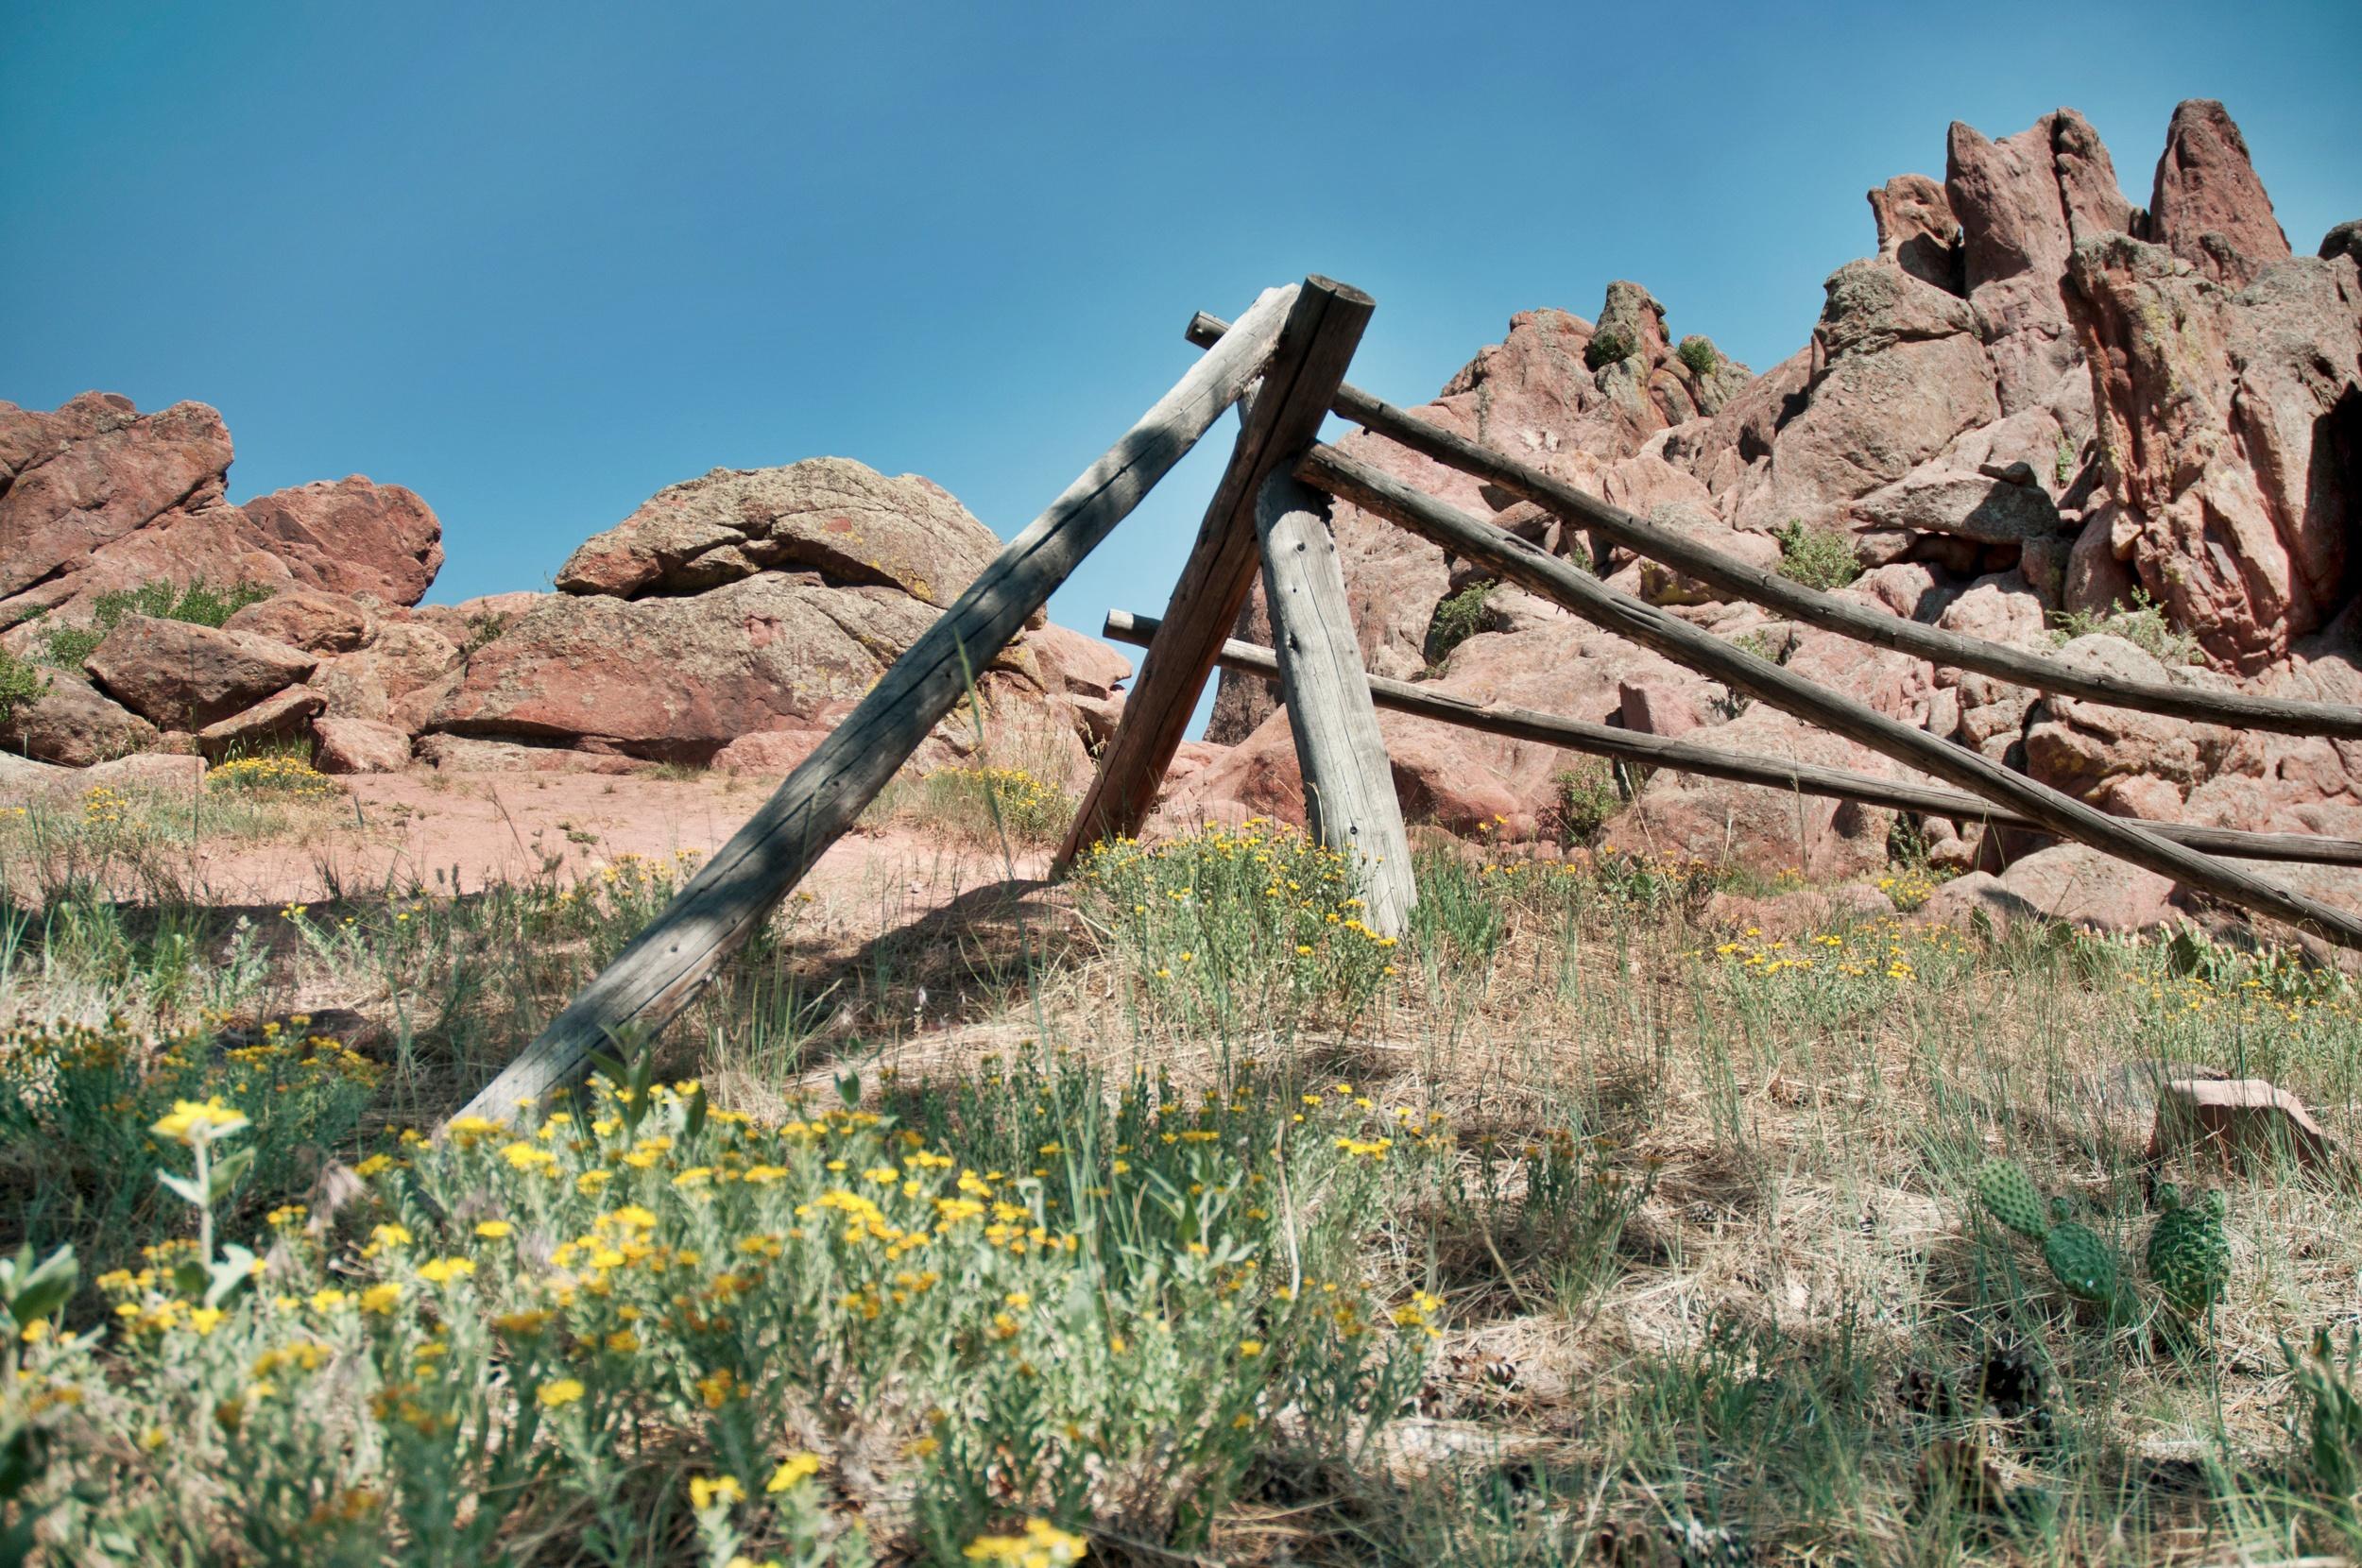 red-rocks-fence-hdr.jpg